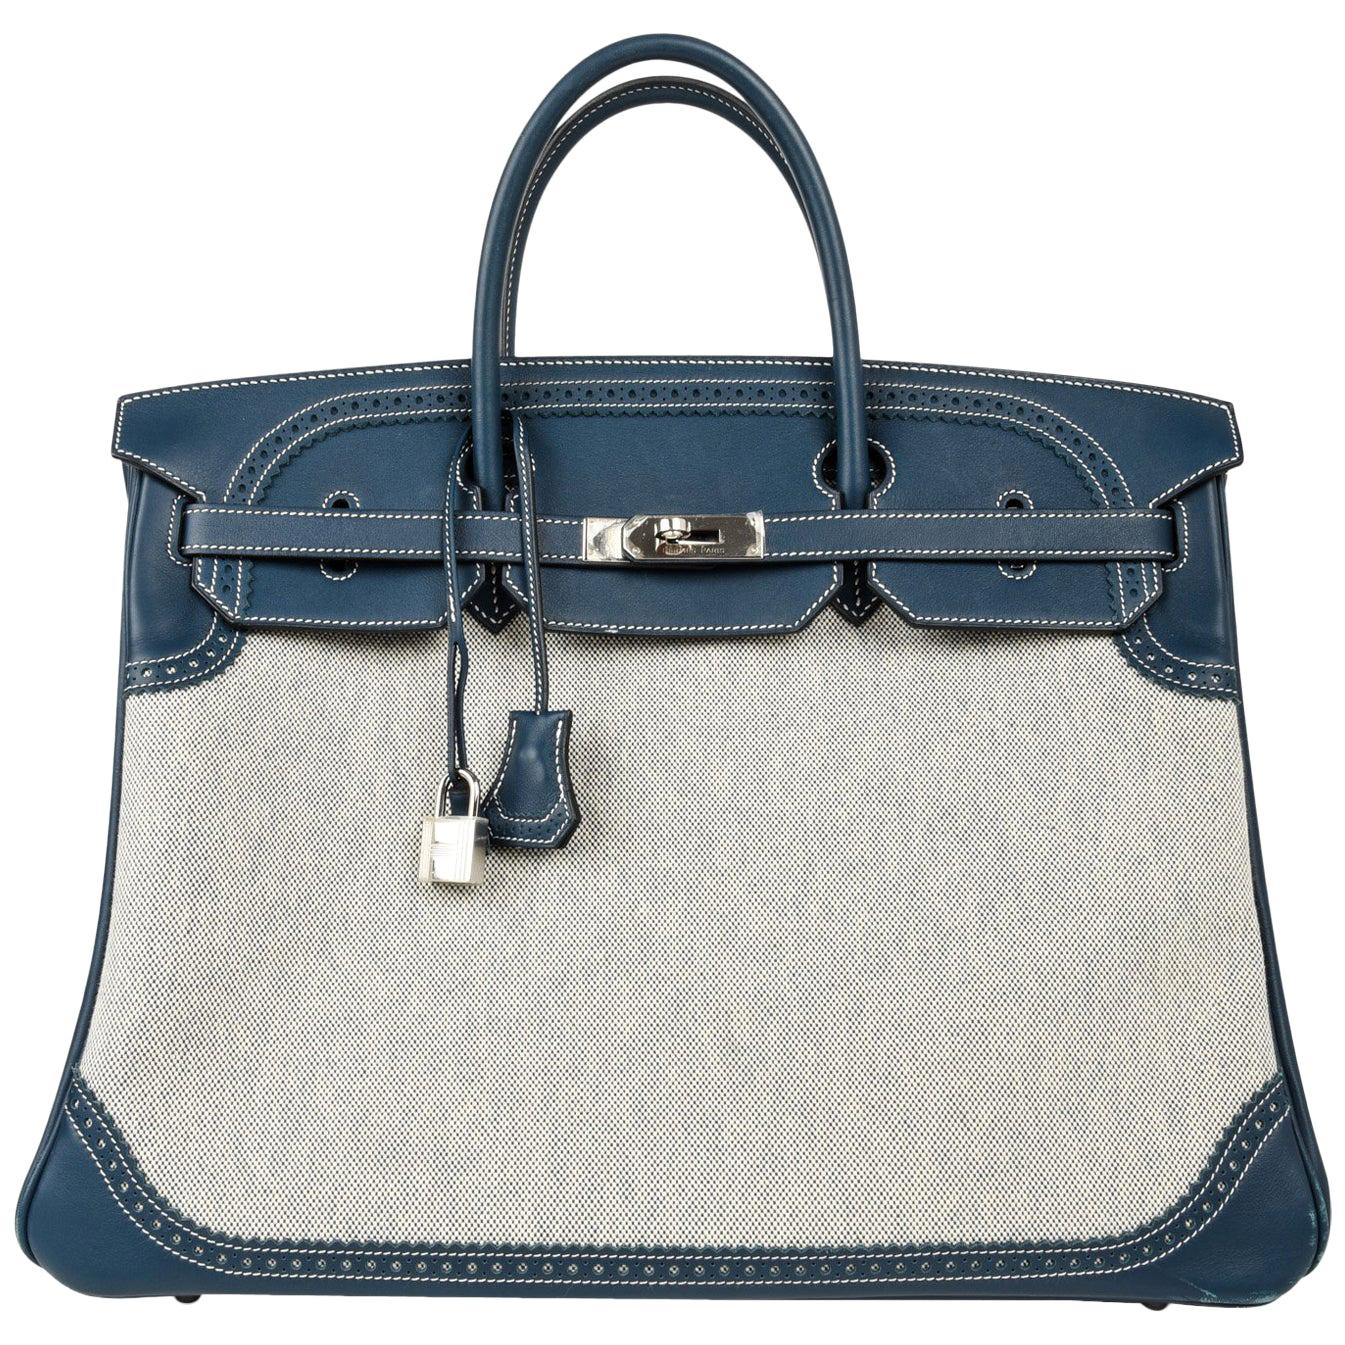 Hermes Birkin 40 Ghillies Bag Blue de Prusse w/ Blue Toile Palladium Hardware